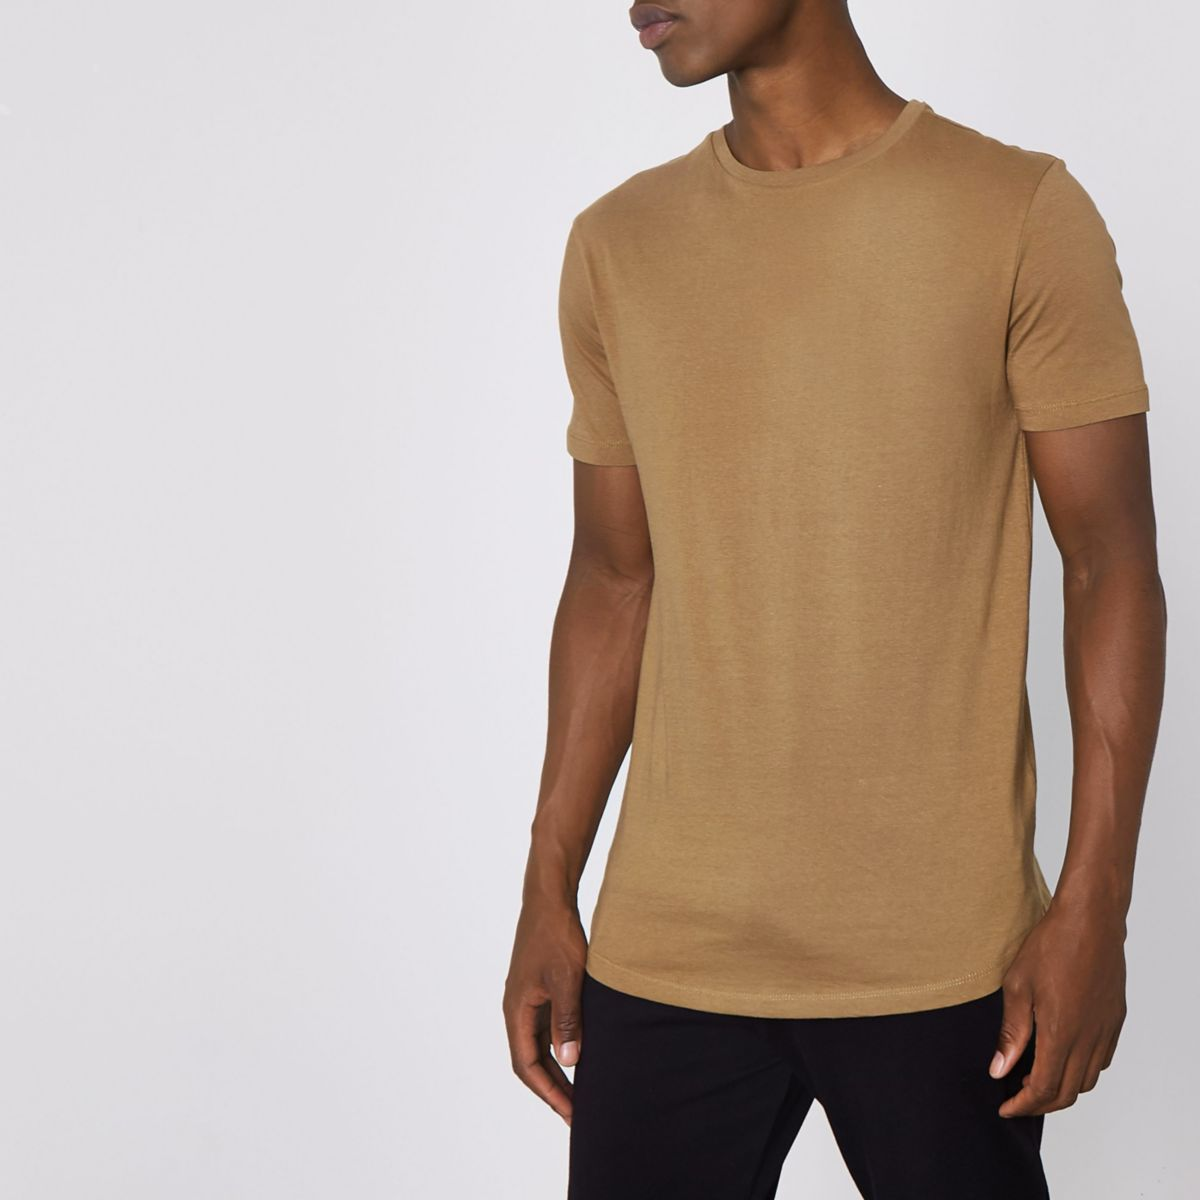 Tan longline curved hem T-shirt